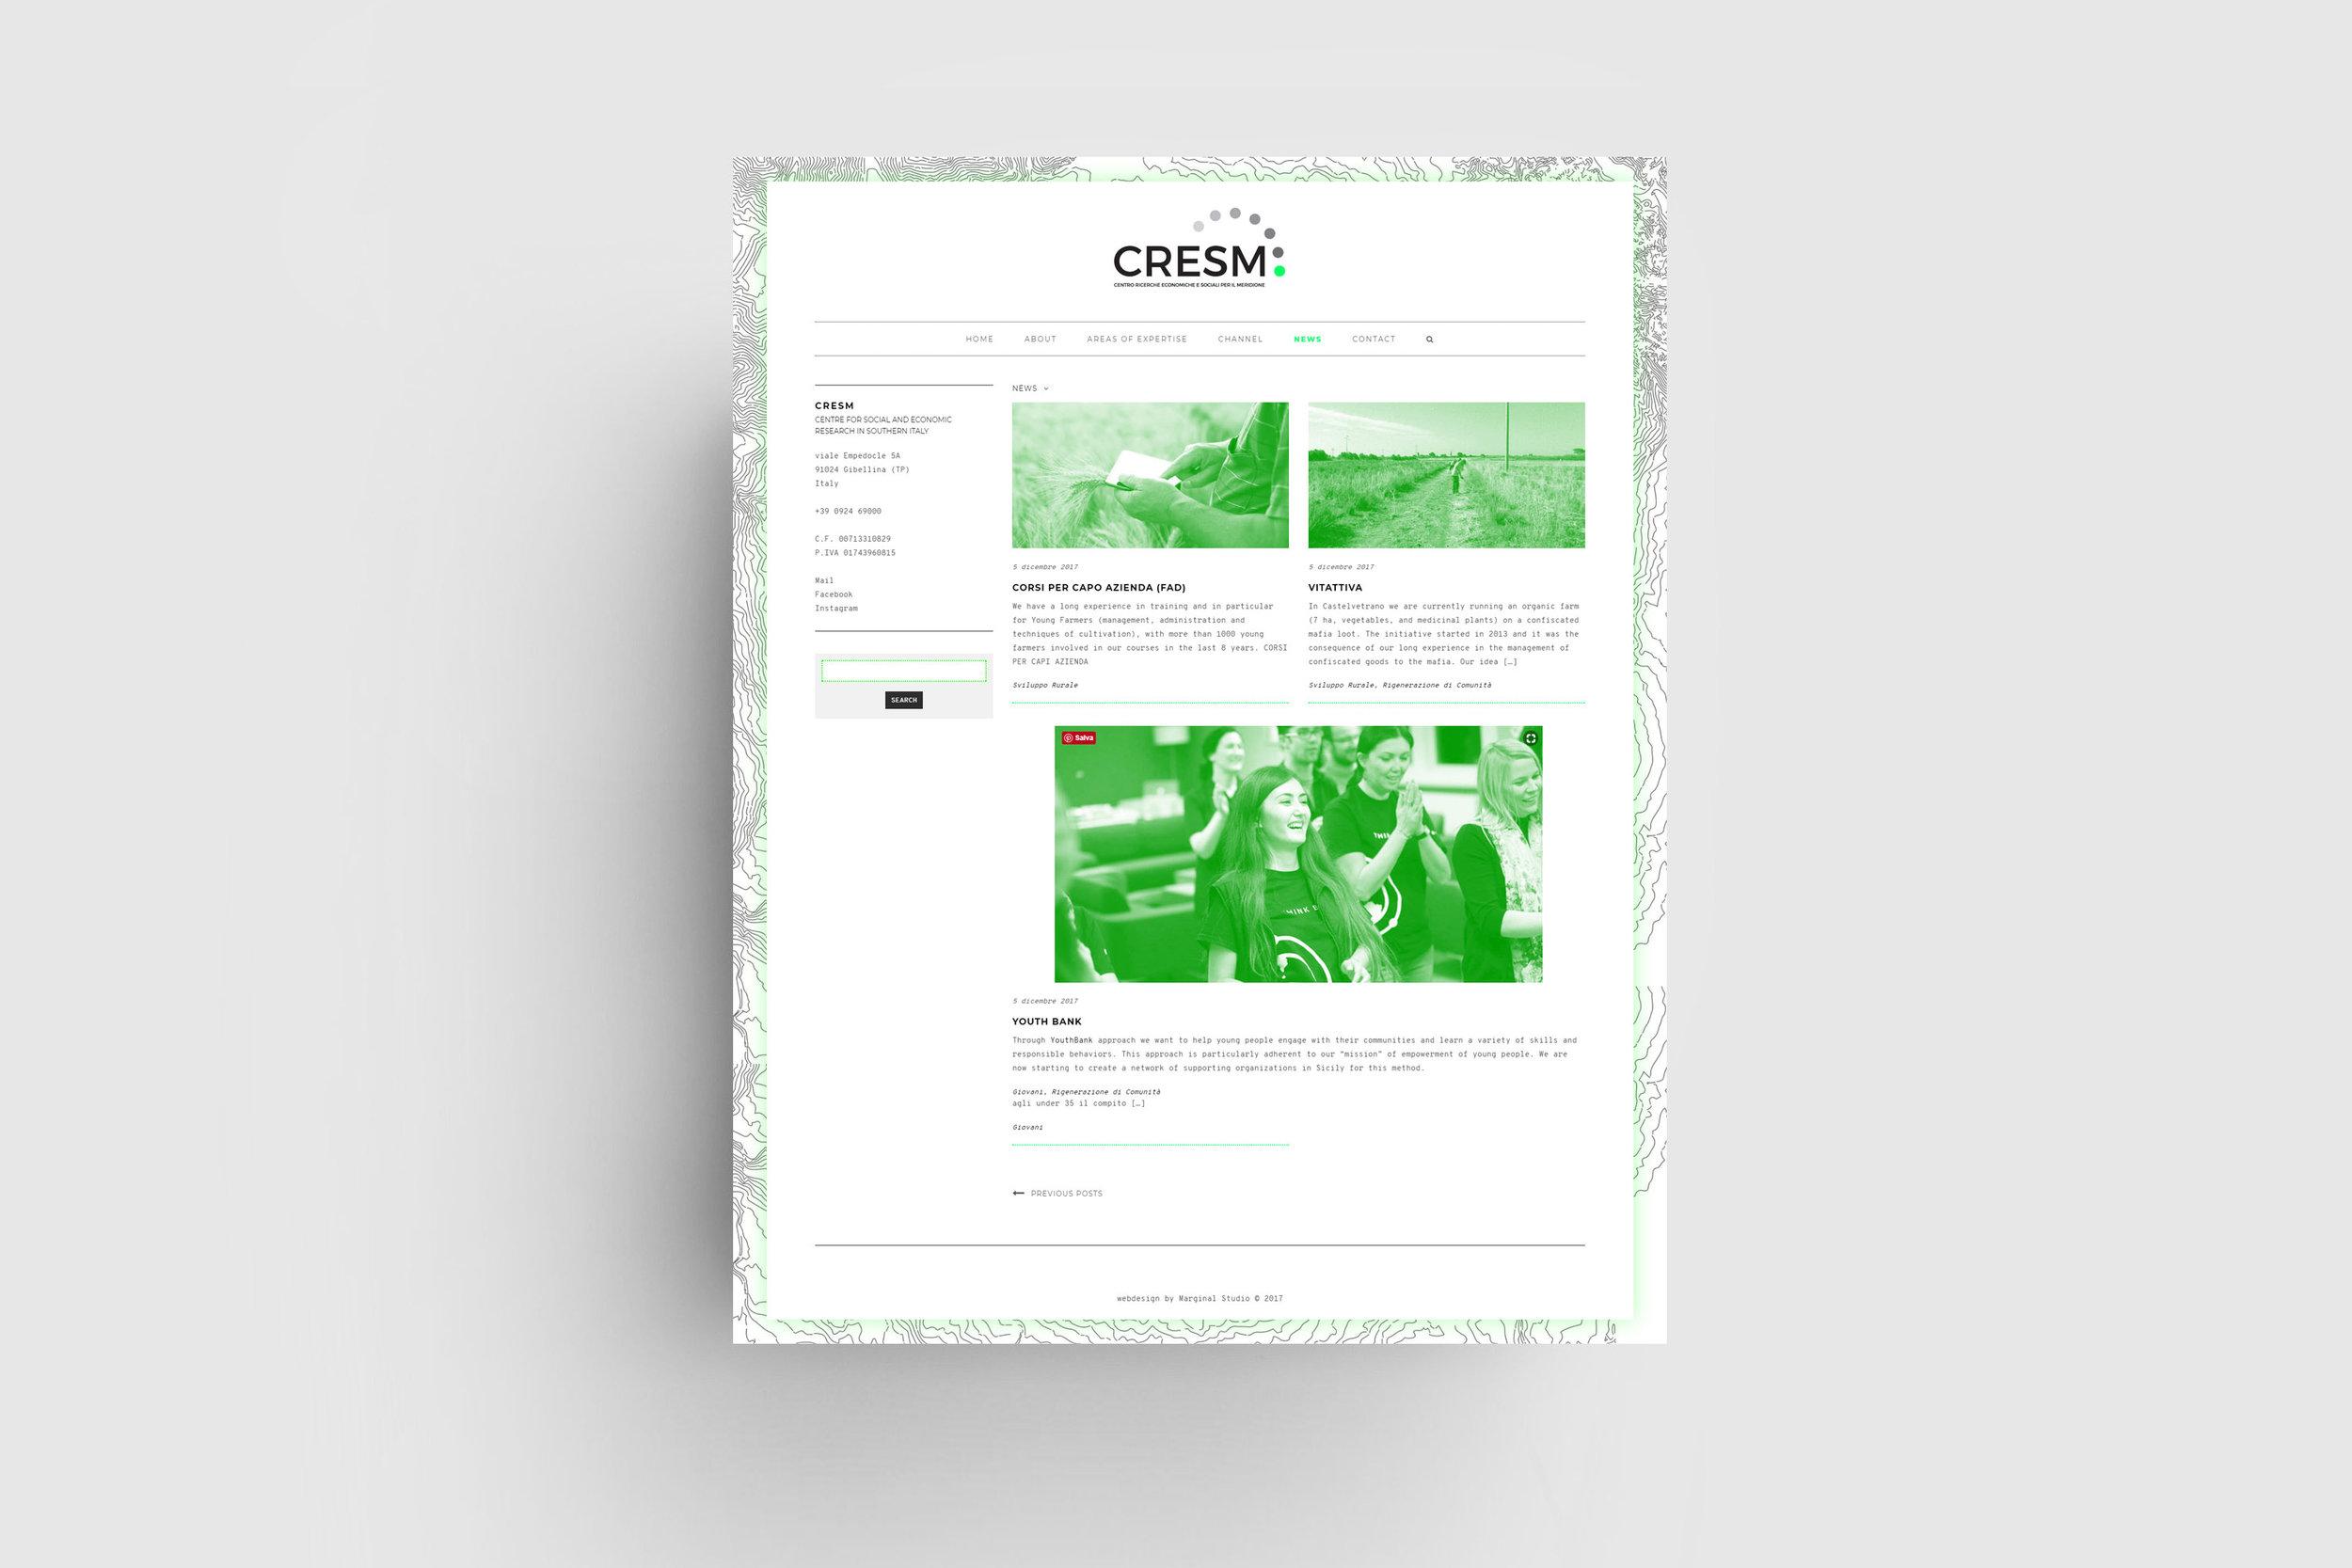 Cresm_DESKTOP - Blog.jpg